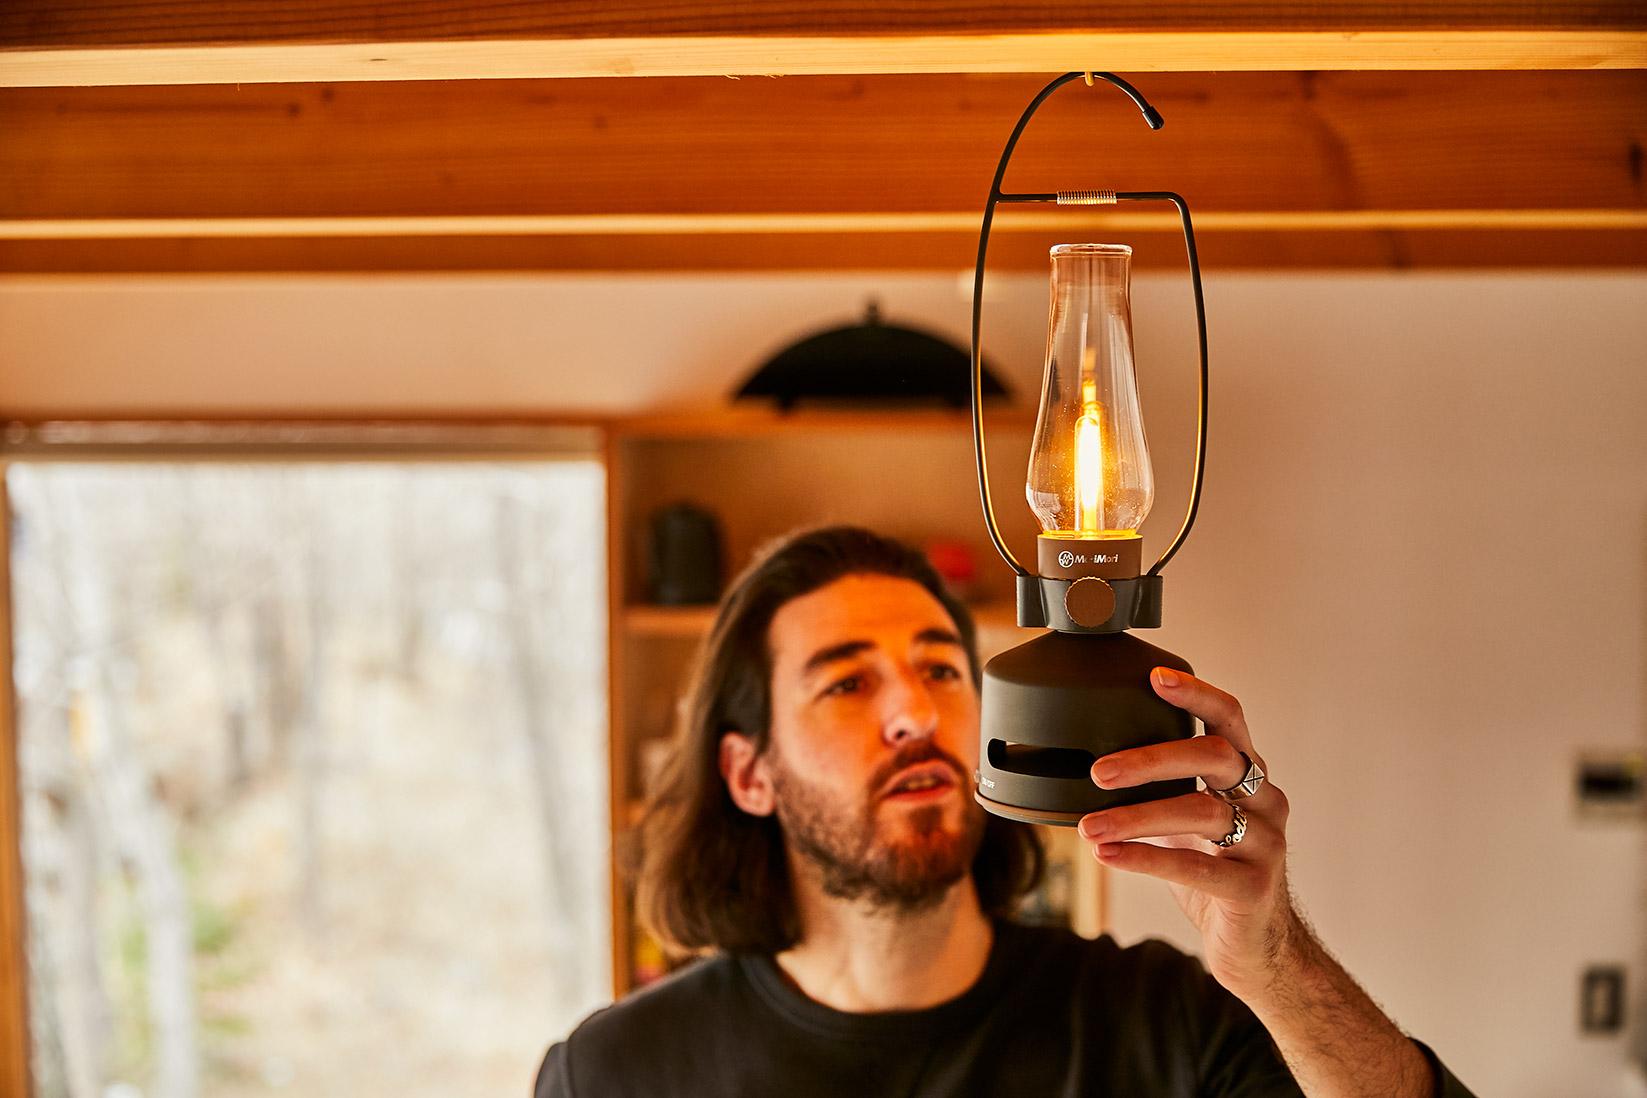 MoriMori LED煤油燈藍牙音響專用吊掛